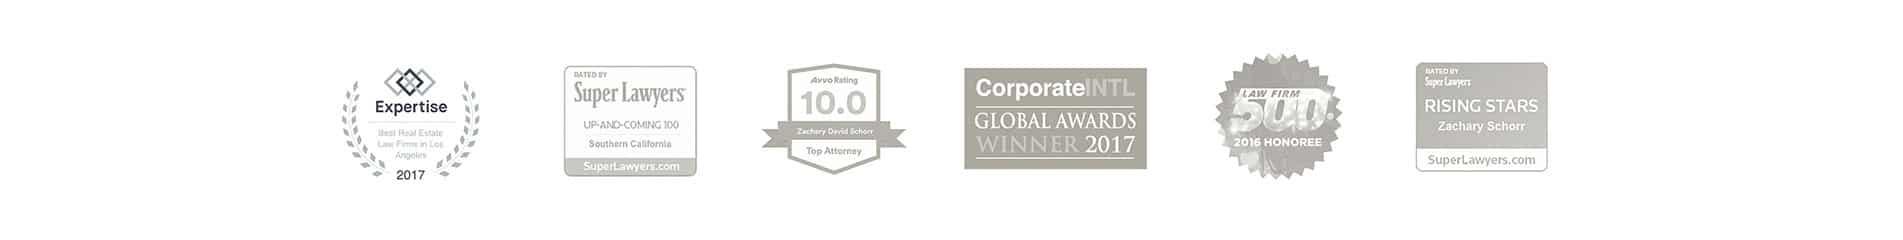 Schorr law real estate litigation attorneys awards solutioingenieria Gallery